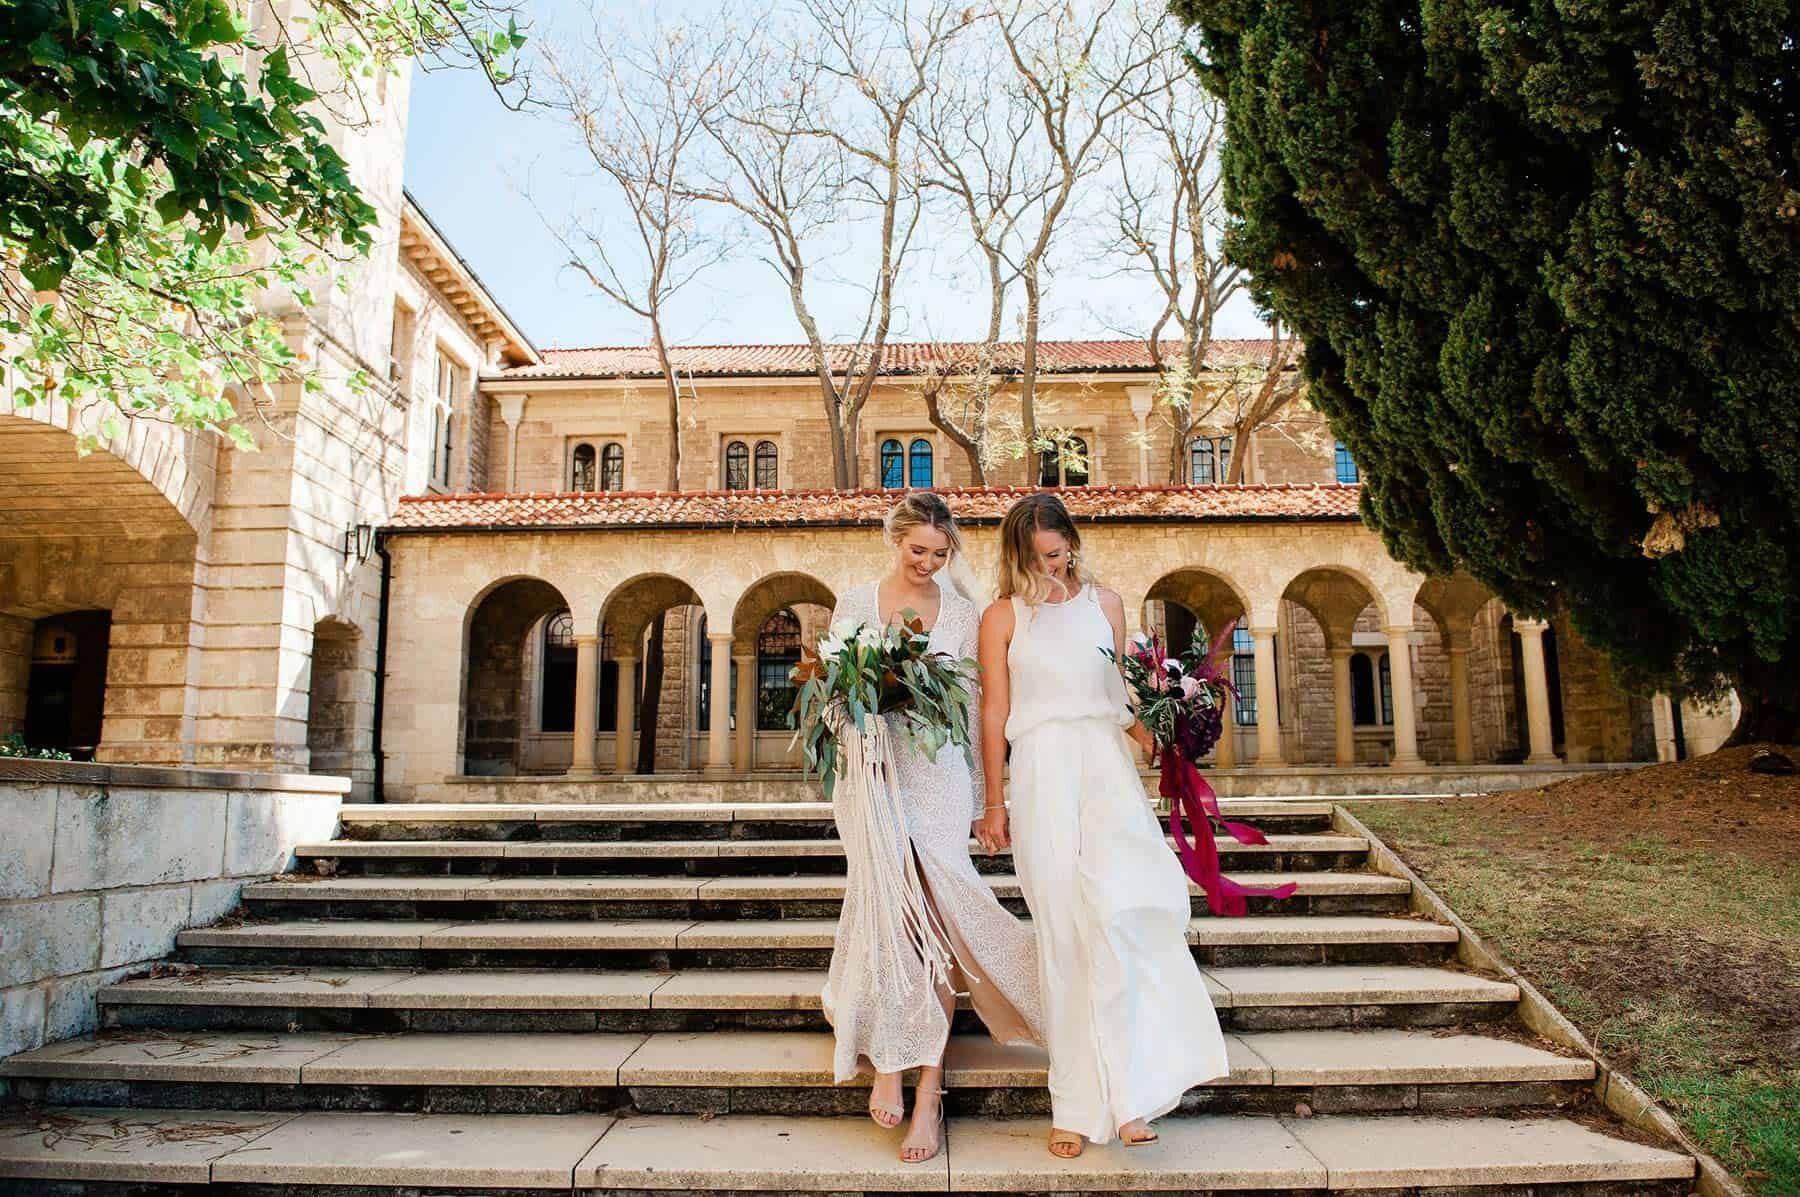 Perth's best boutique bridal fair - Wedding Upmarket 2019